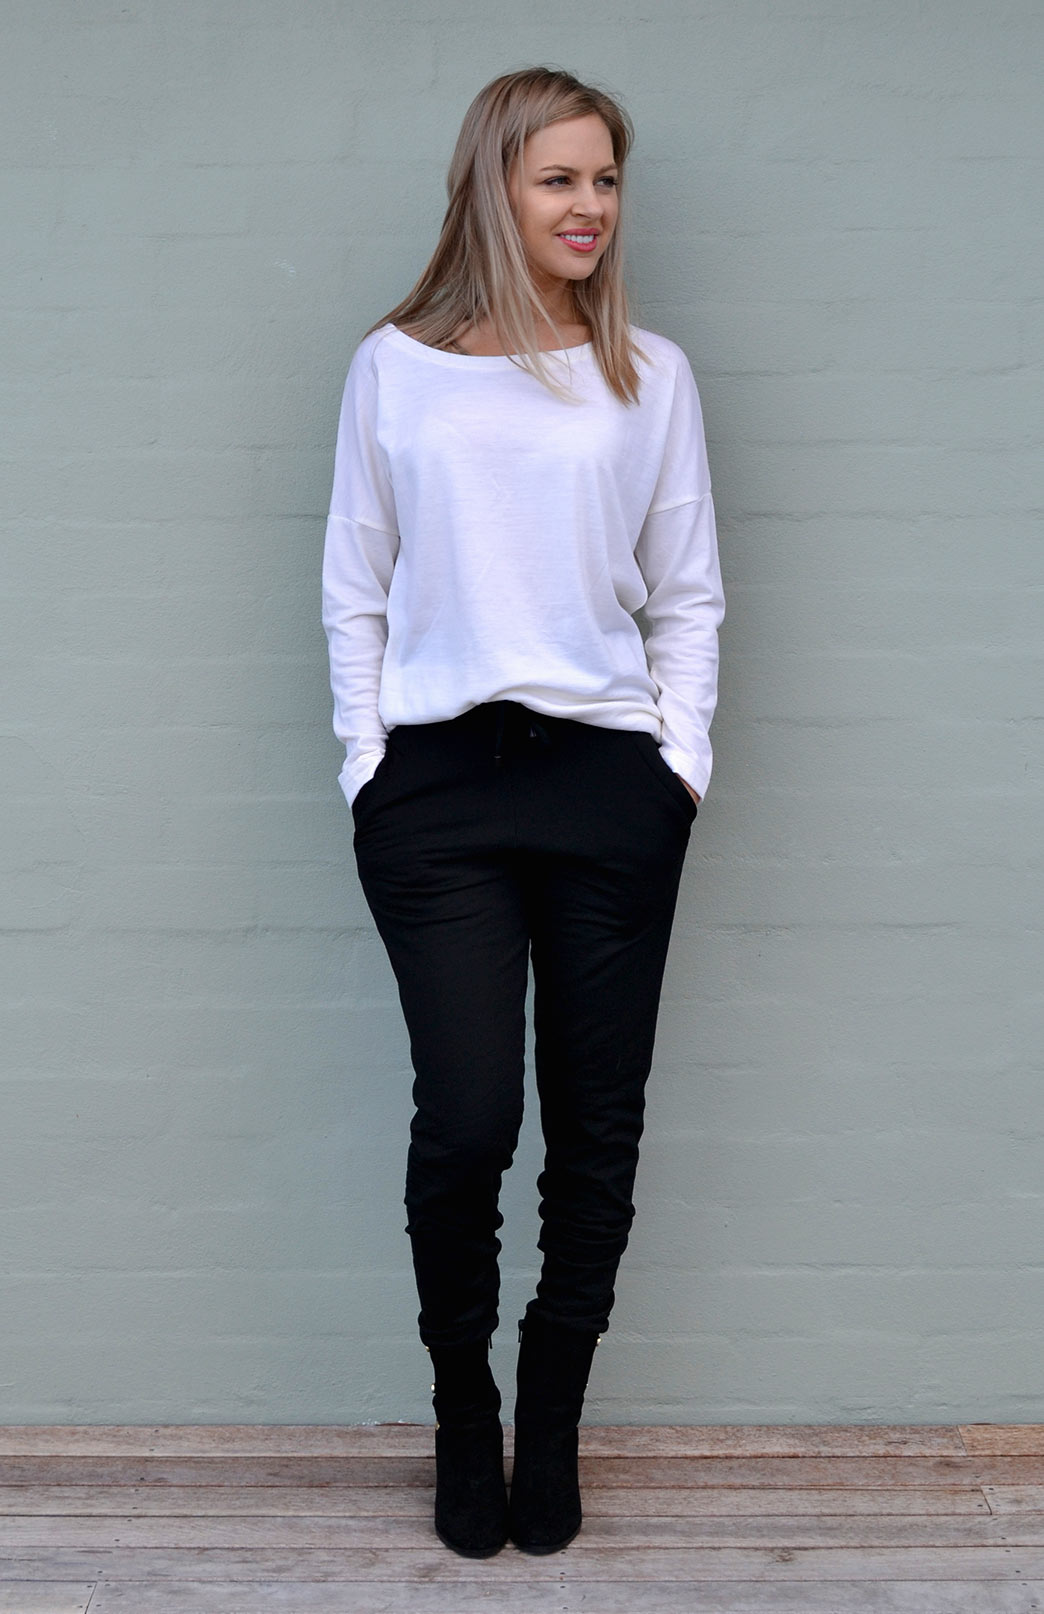 Cruise Top - Women's Ivory Cream Long Sleeved Drop Shoulder Wool Top - Smitten Merino Tasmania Australia